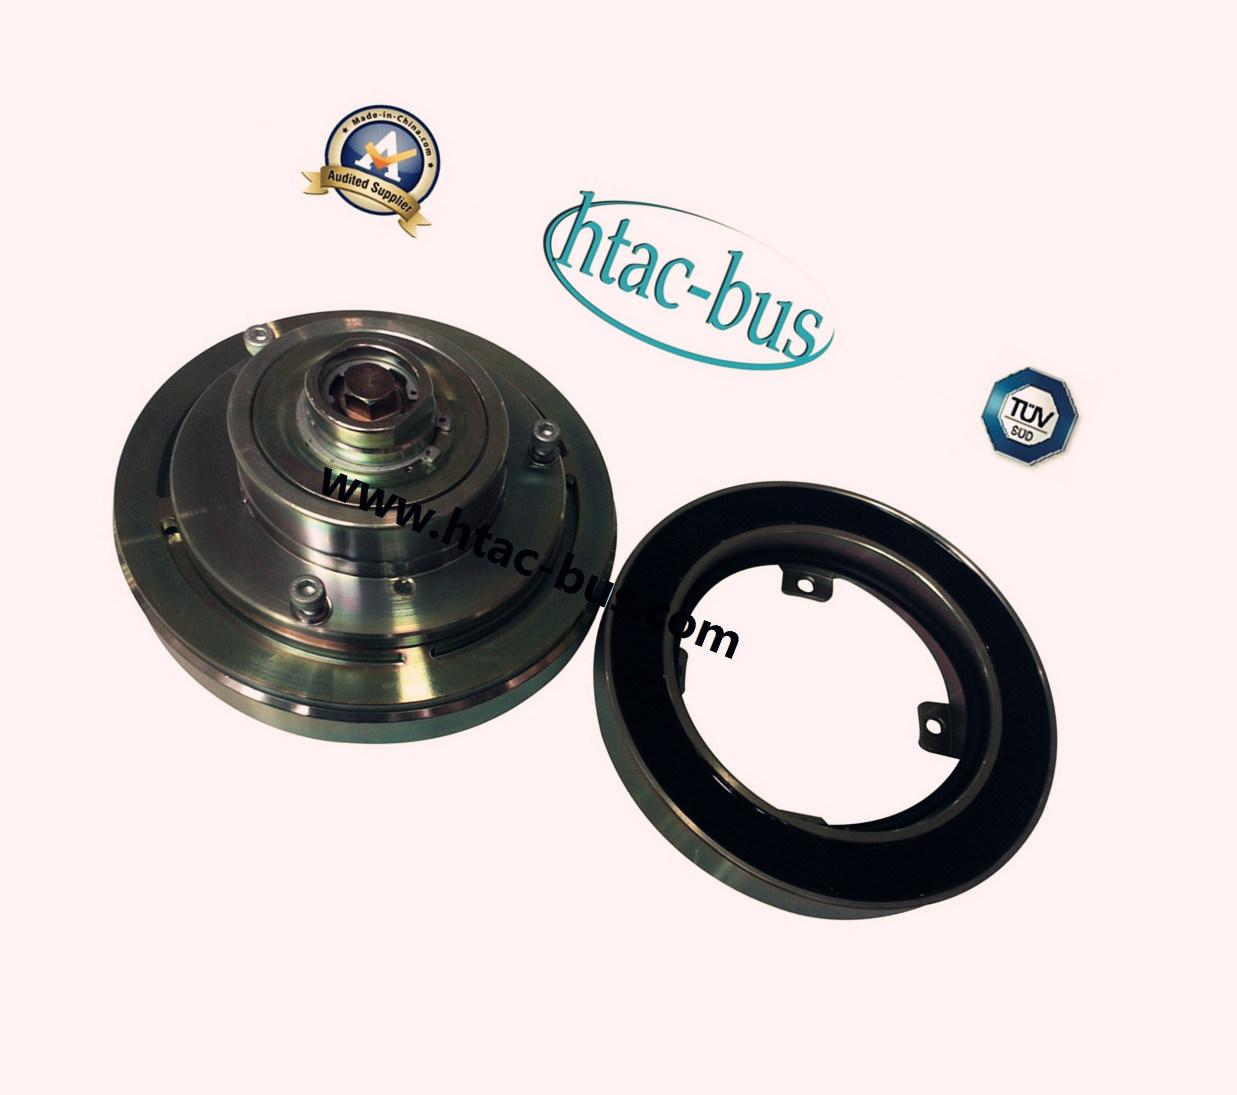 A/C Magnetic Clutch Flange La16.03, La16.068